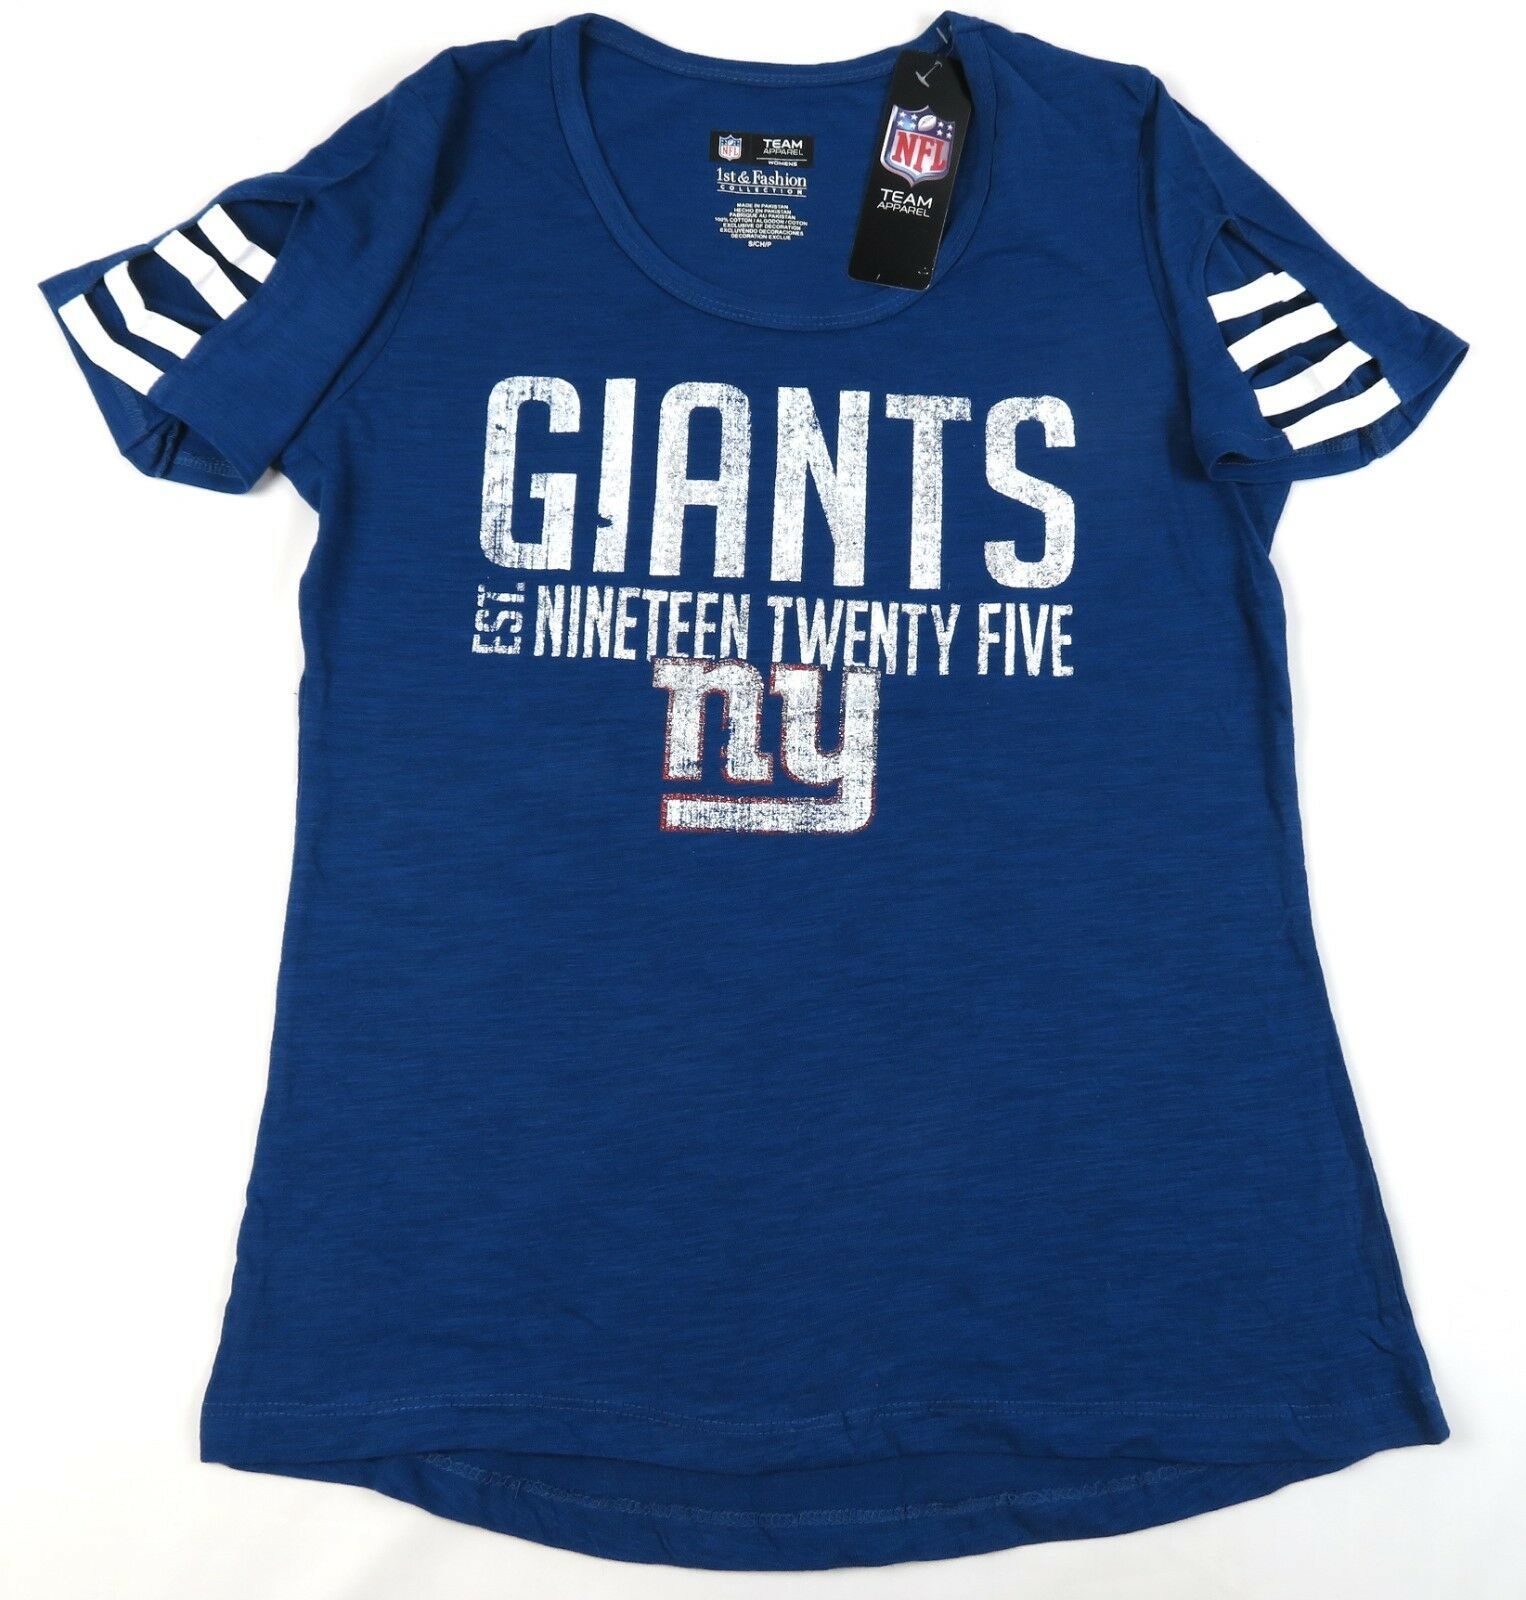 New York Giants Women's Tee Shirt NFL Vintage est. 1925 Cut-out Sleeves T-Shirt